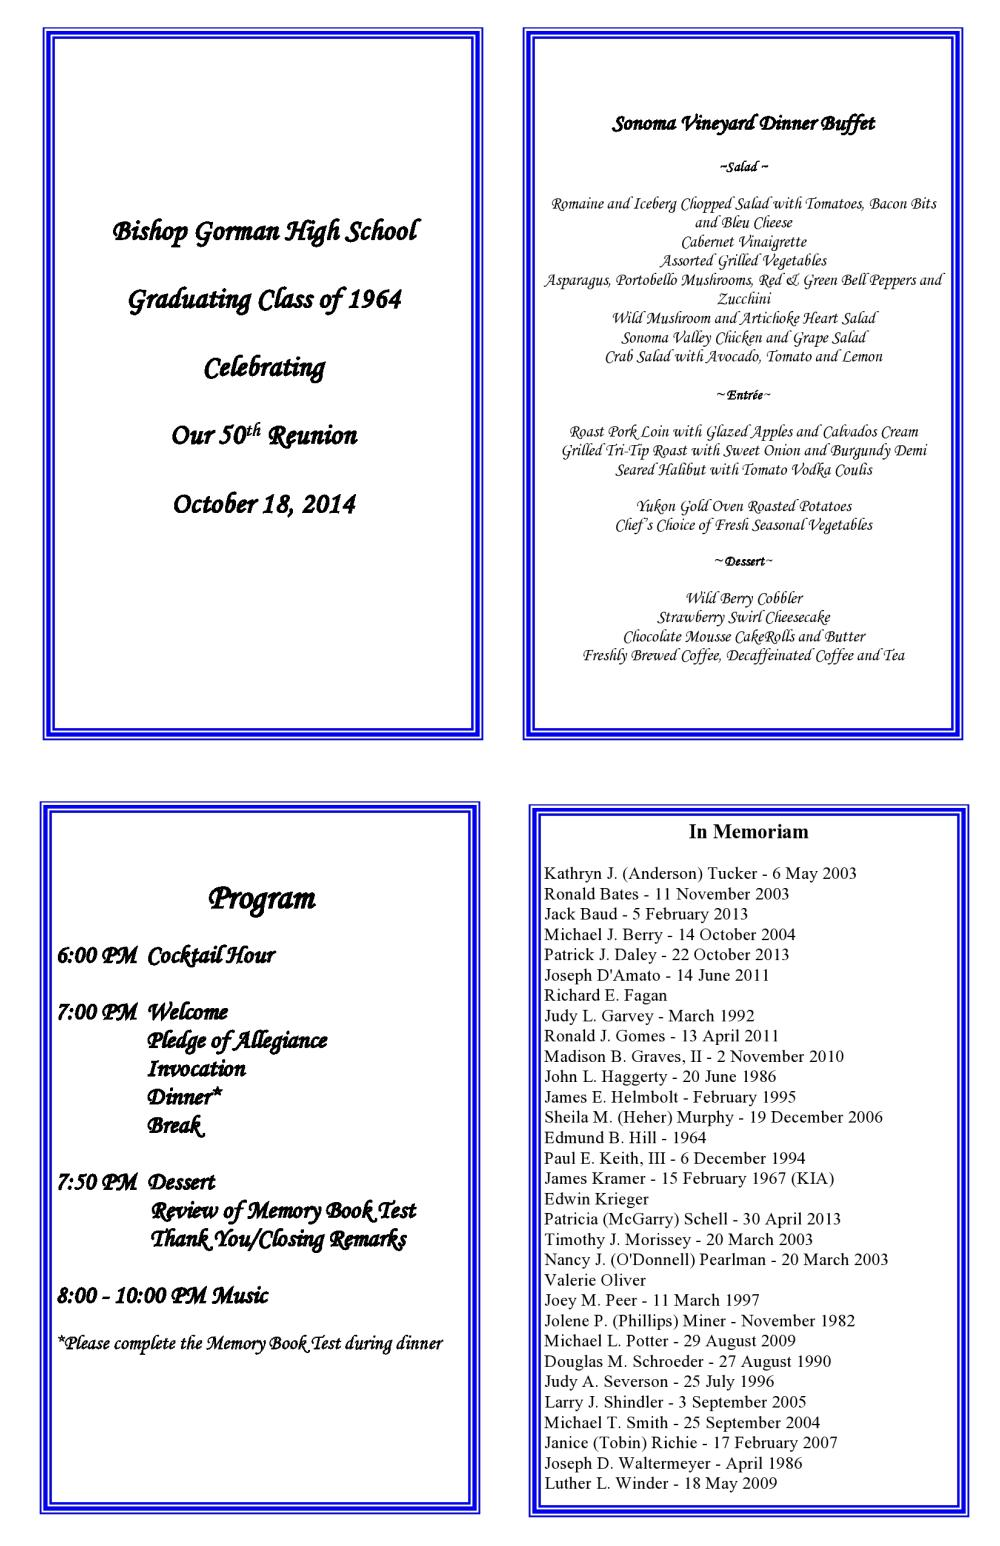 BGHS 64 - 50th Reunion Information